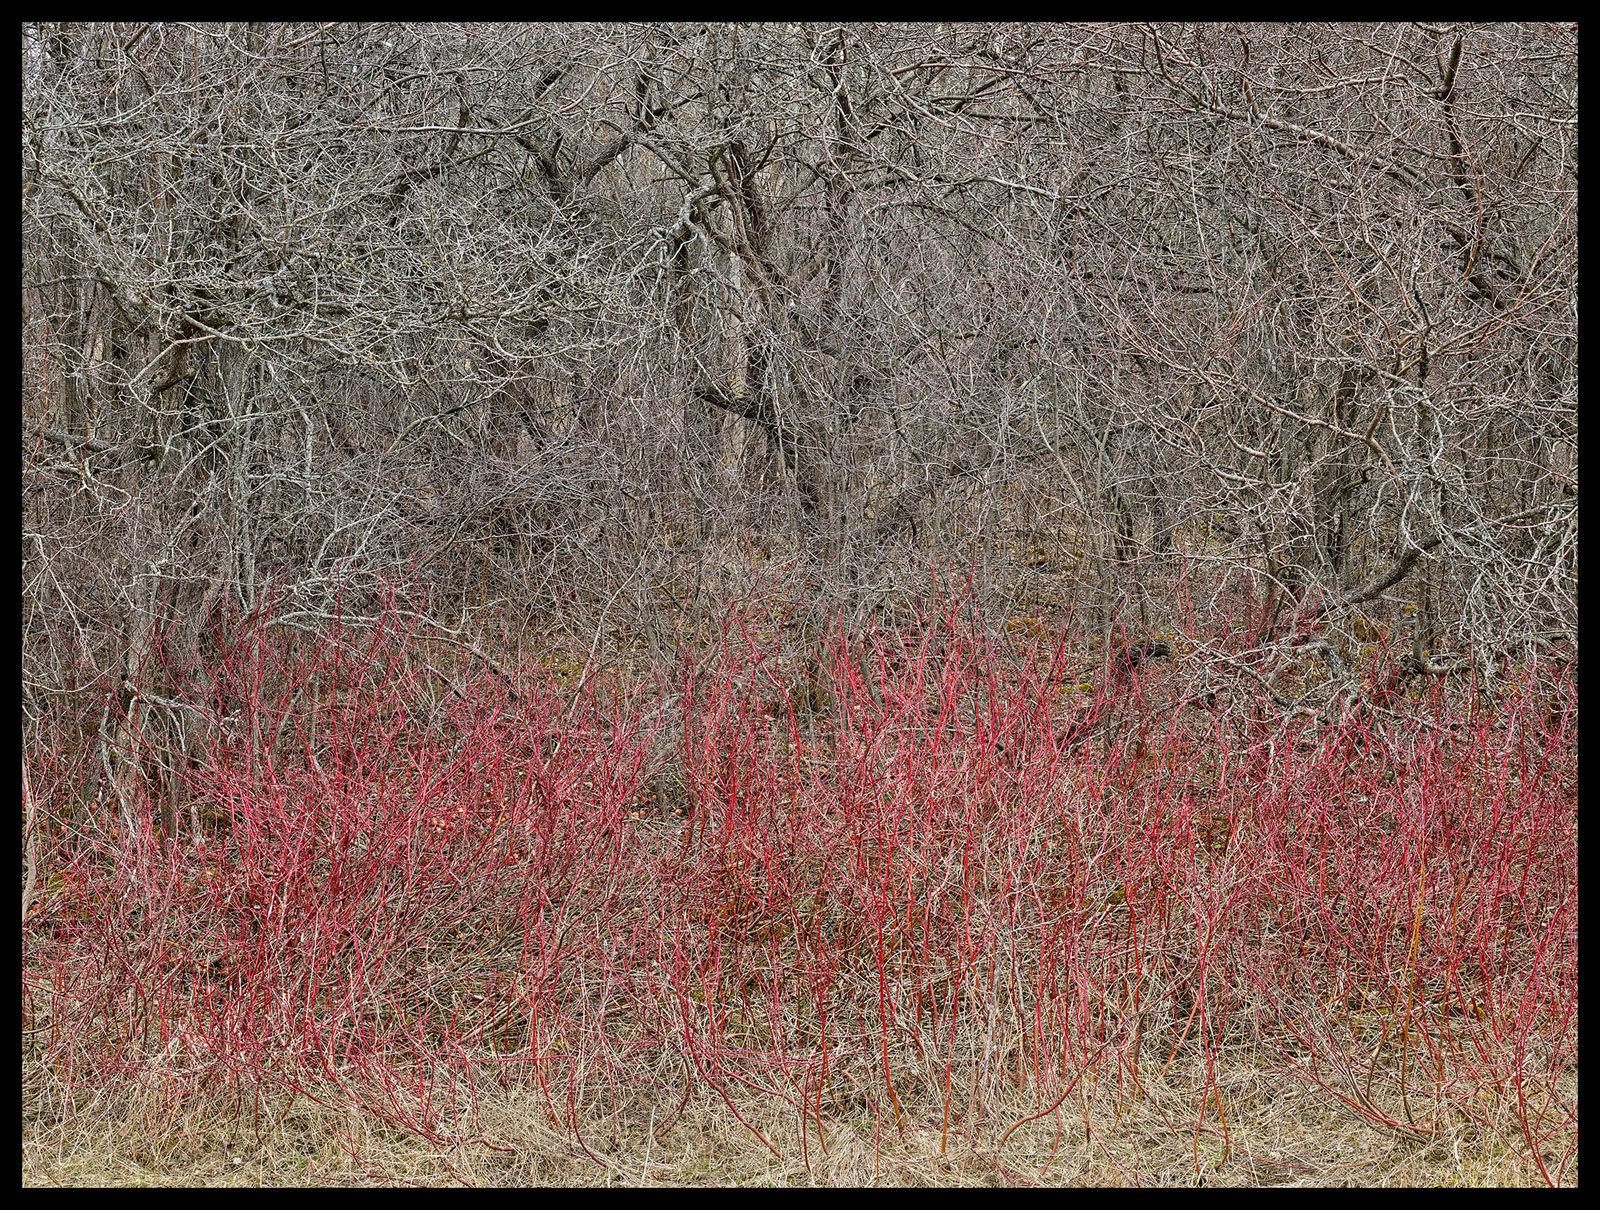 Edward Burtynsky, Natural Order #18, Grey County, Ontario, Canada, Spring, 2020